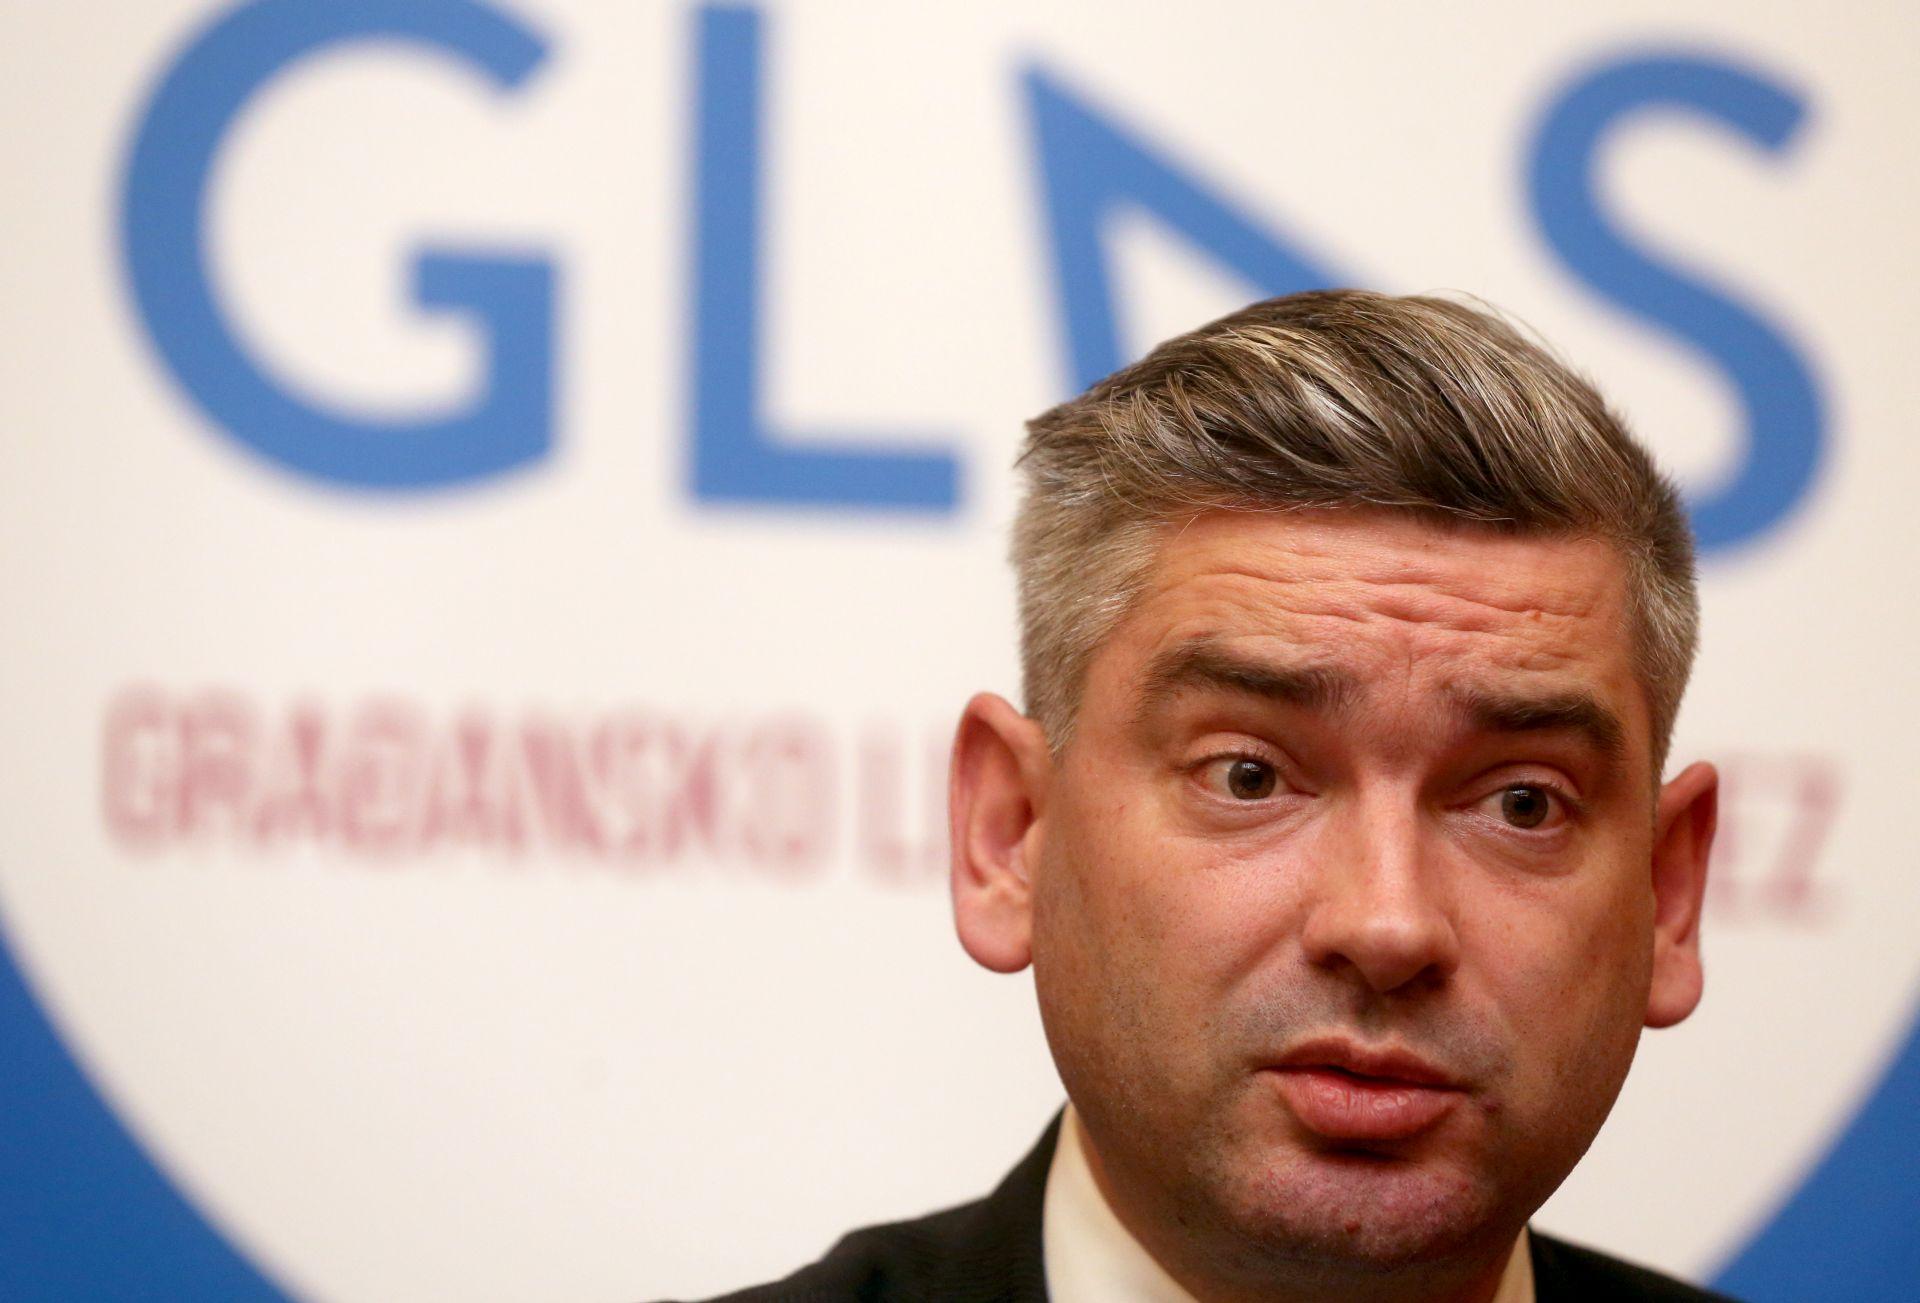 Miletić: Brodogradnja je nacionalni interes, država je mora štititi